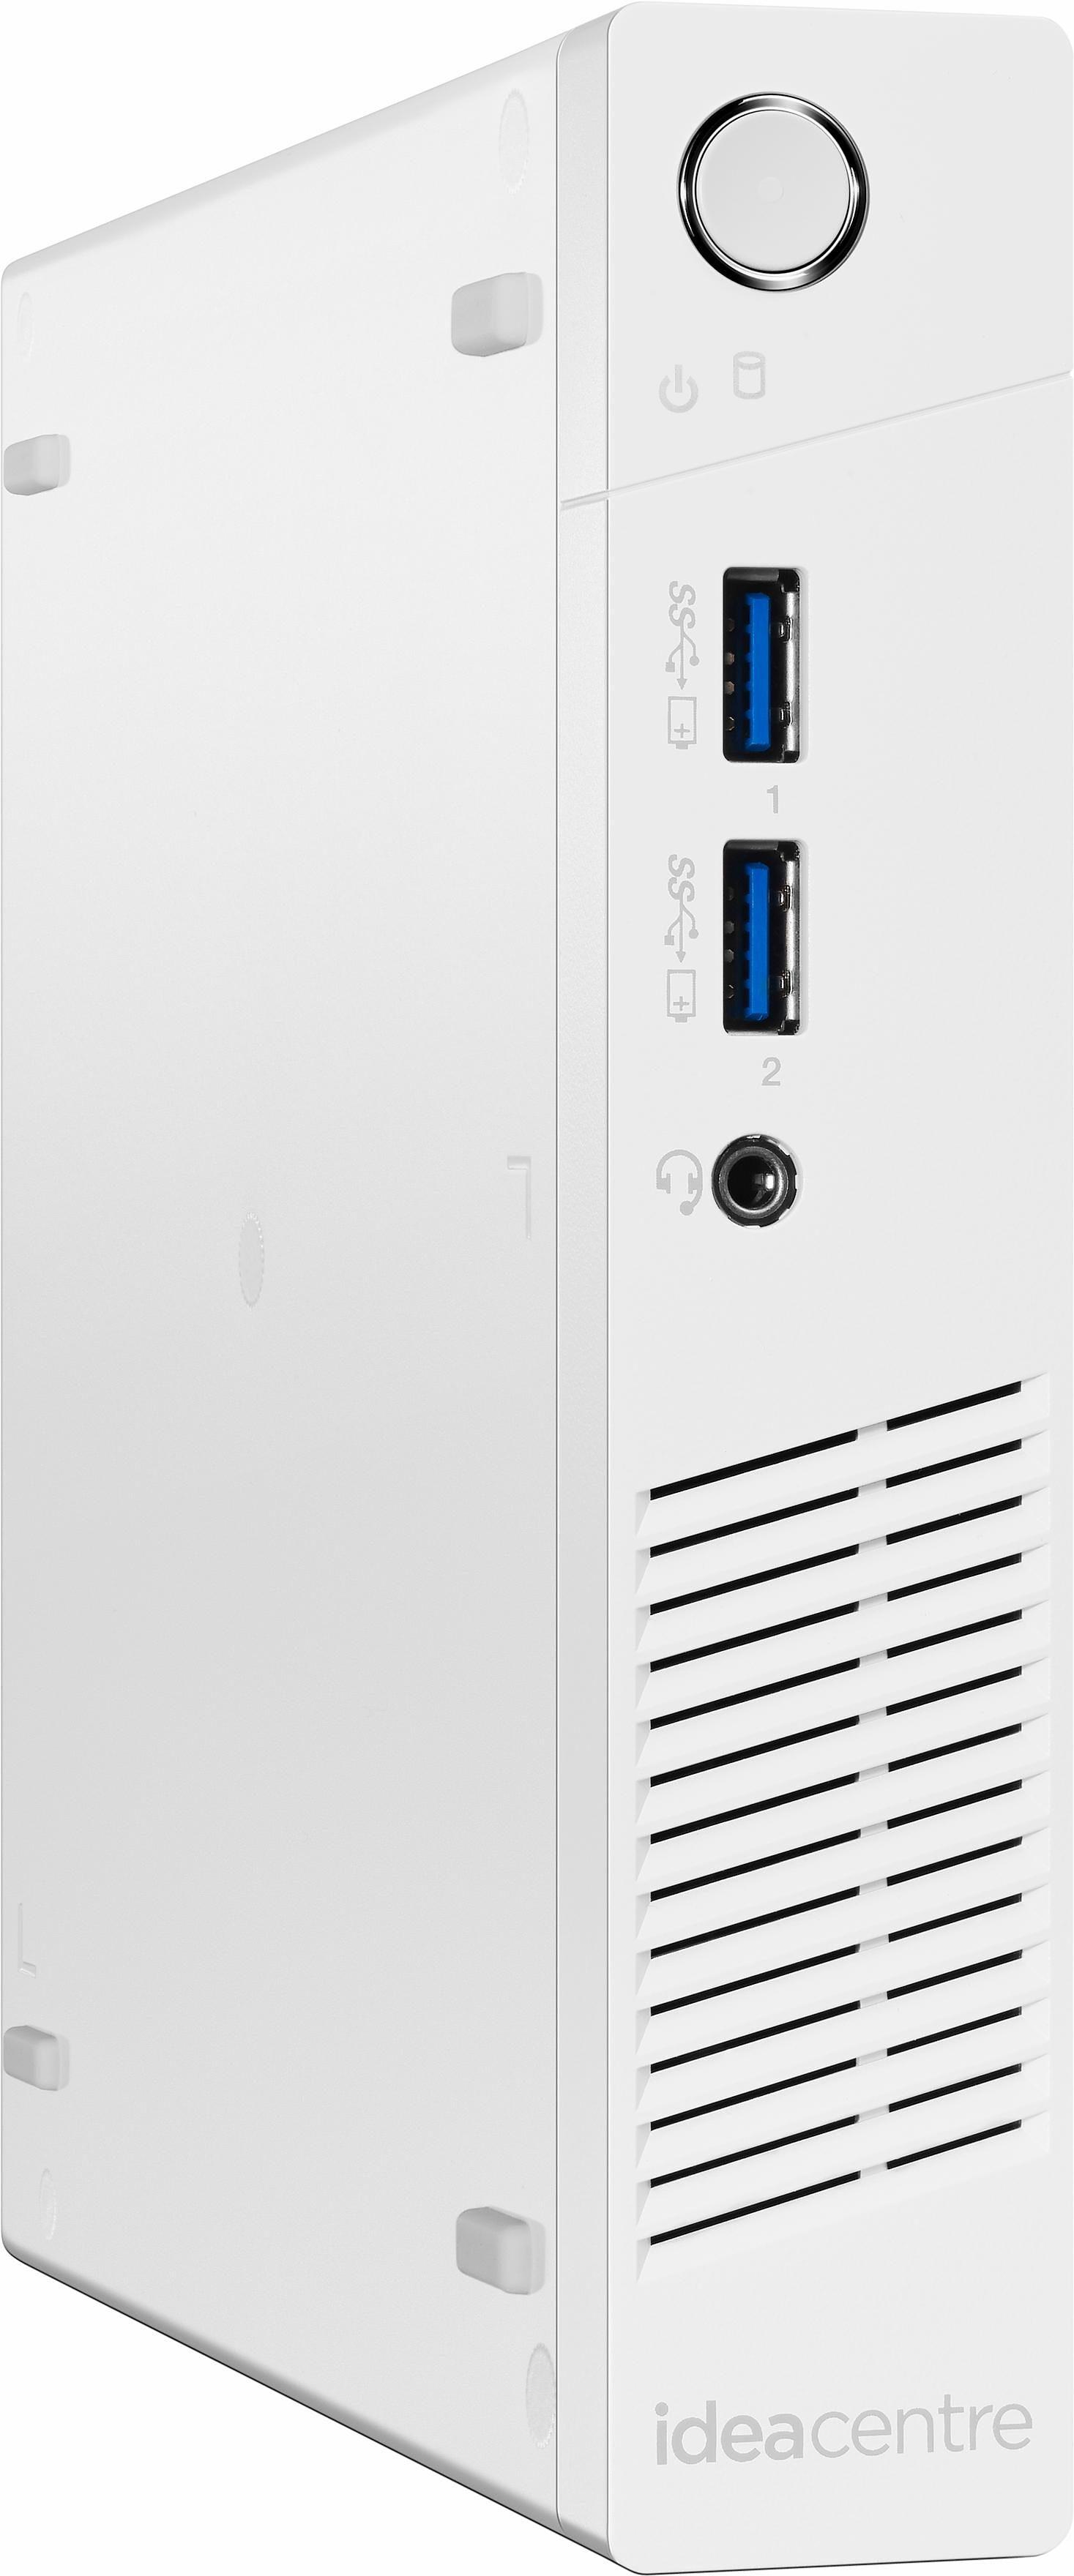 Lenovo Ideacentre 200-01IBW PC, Intel® Core™ i3, 4096 MB DDR3-SDRAM, 1000 GB Speicher